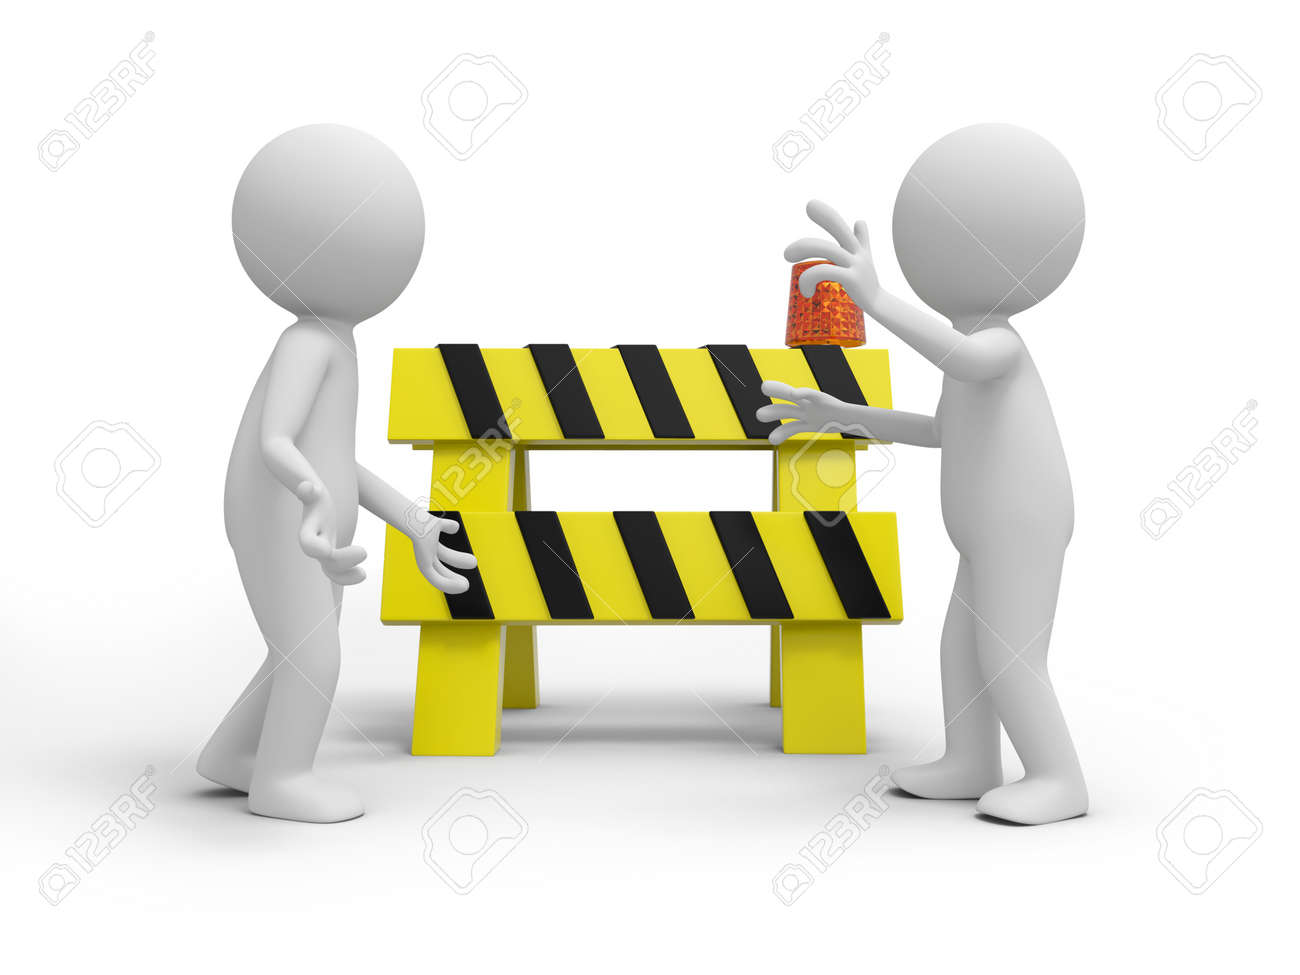 Two 3d people talking, a roadblocks background Stock Photo - 20887013